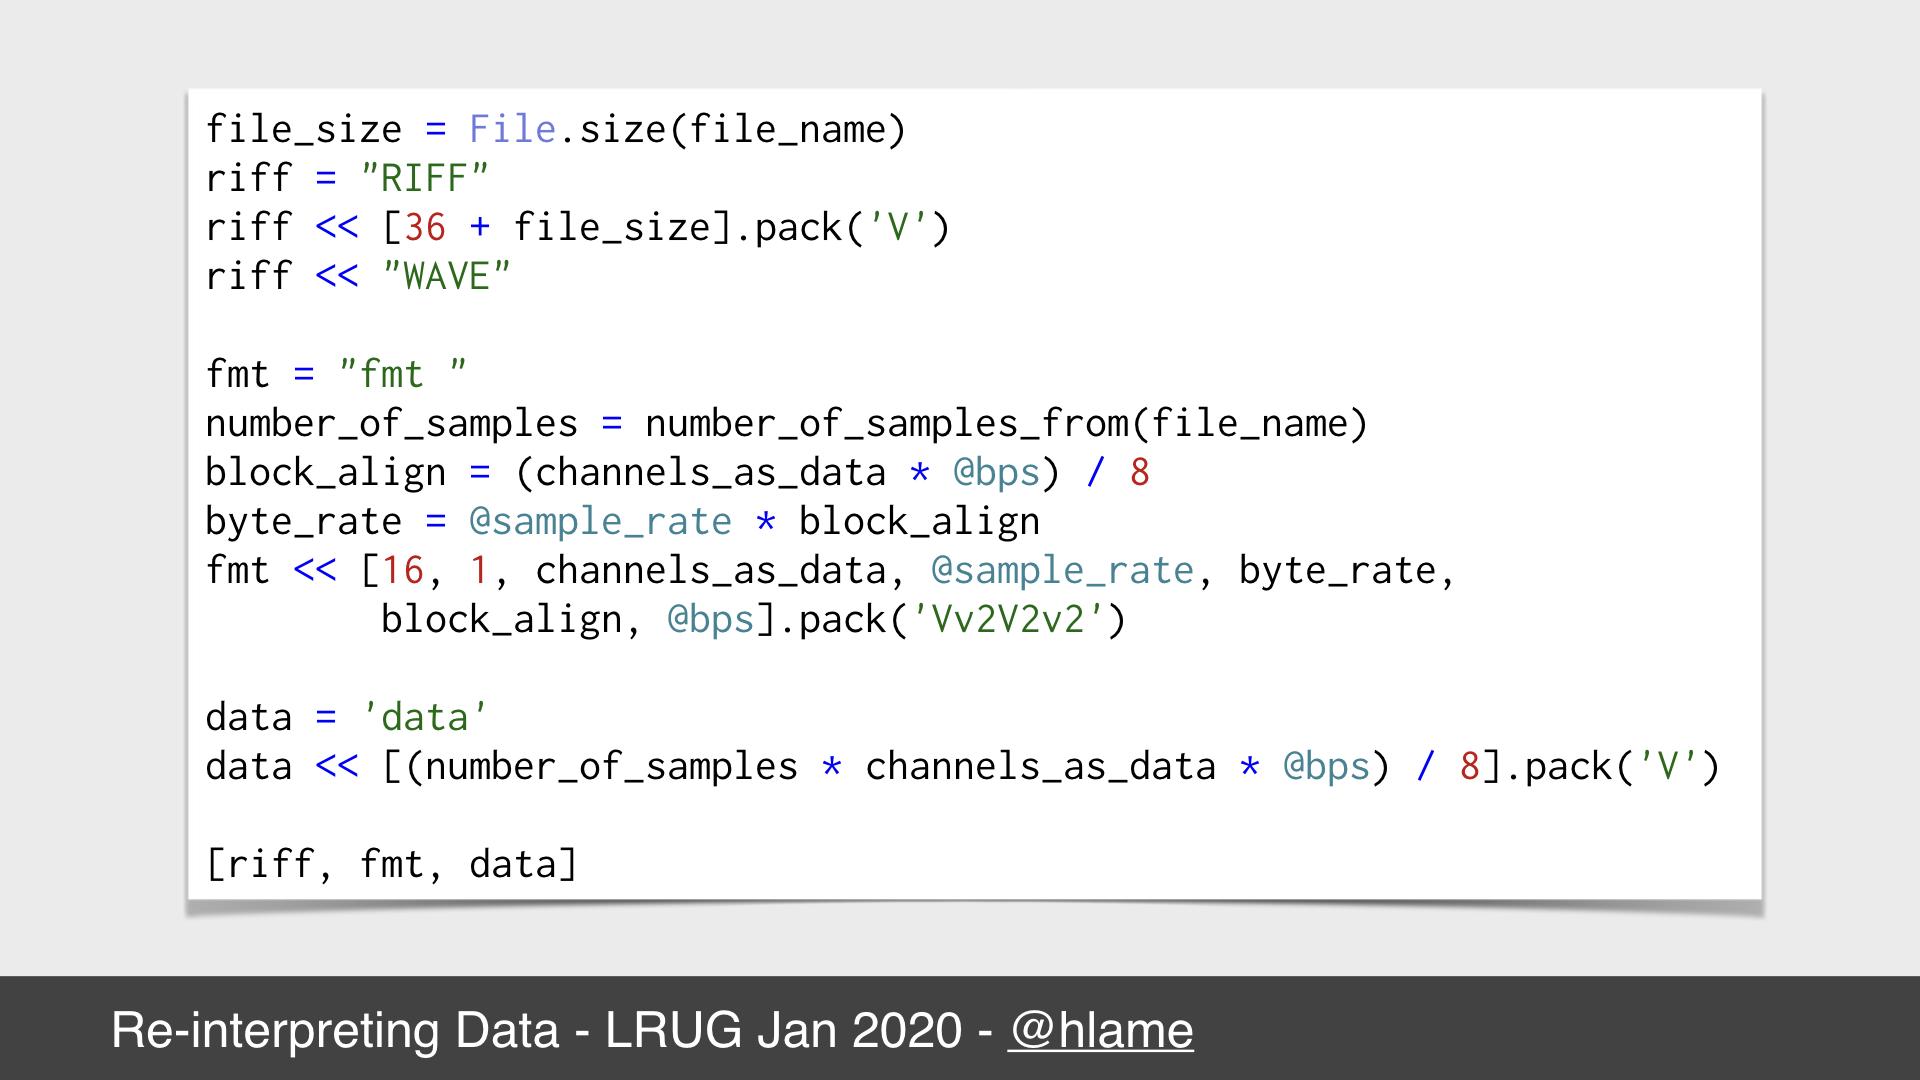 Snippet of code showing how we can construct a wave file header in ruby.  source: https://github.com/h-lame/stegosaurus/blob/d05db3eecd0d328c9de7886dcedbb16b189b3c5d/lib/stegosaurus/waves.rb#L76-L97